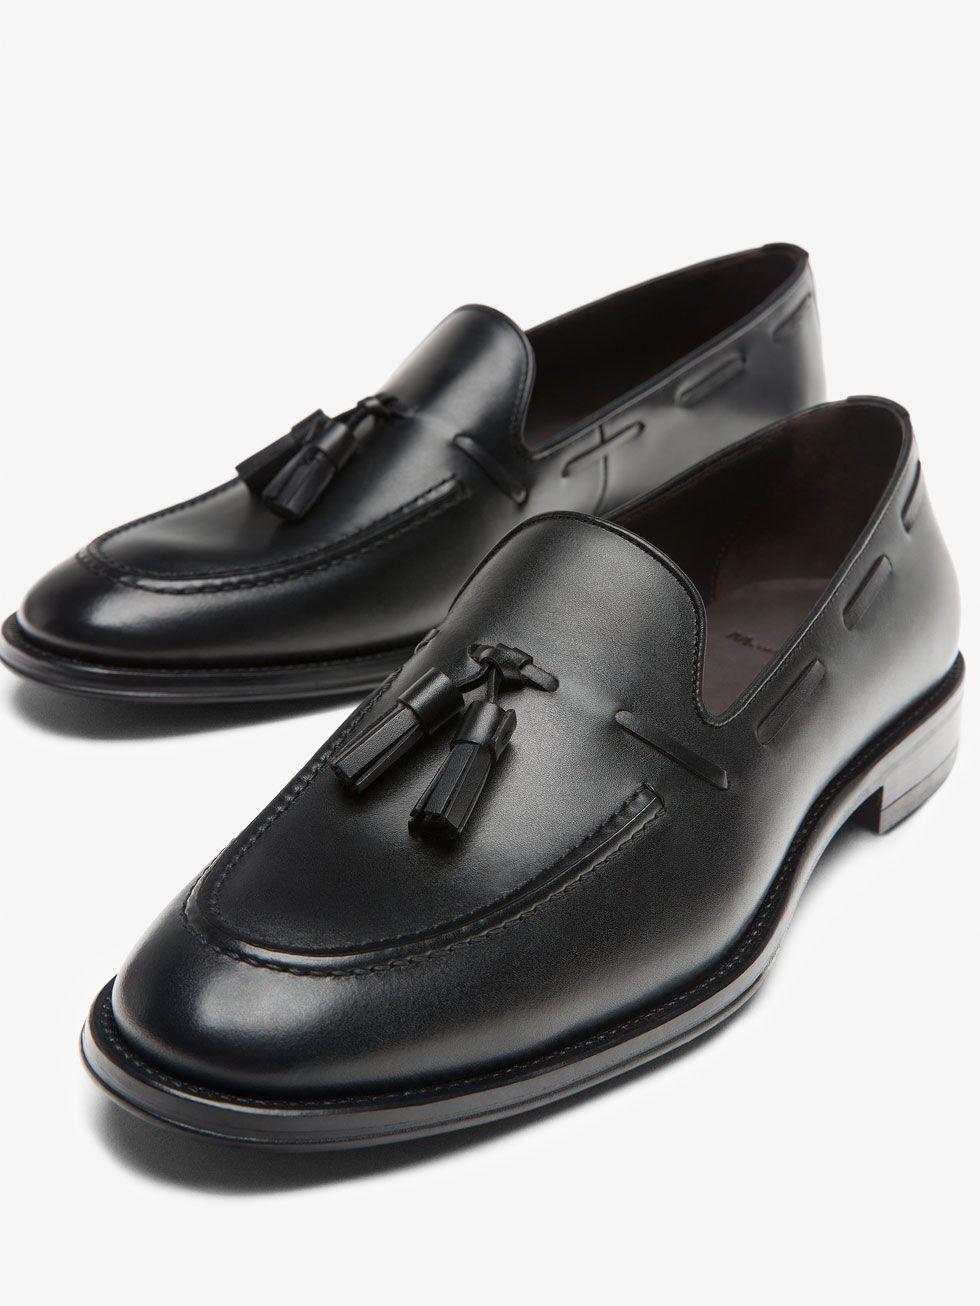 Hombre Charles Road Slip-On Cuero Negro 7 W (EE) fFXDFPK3